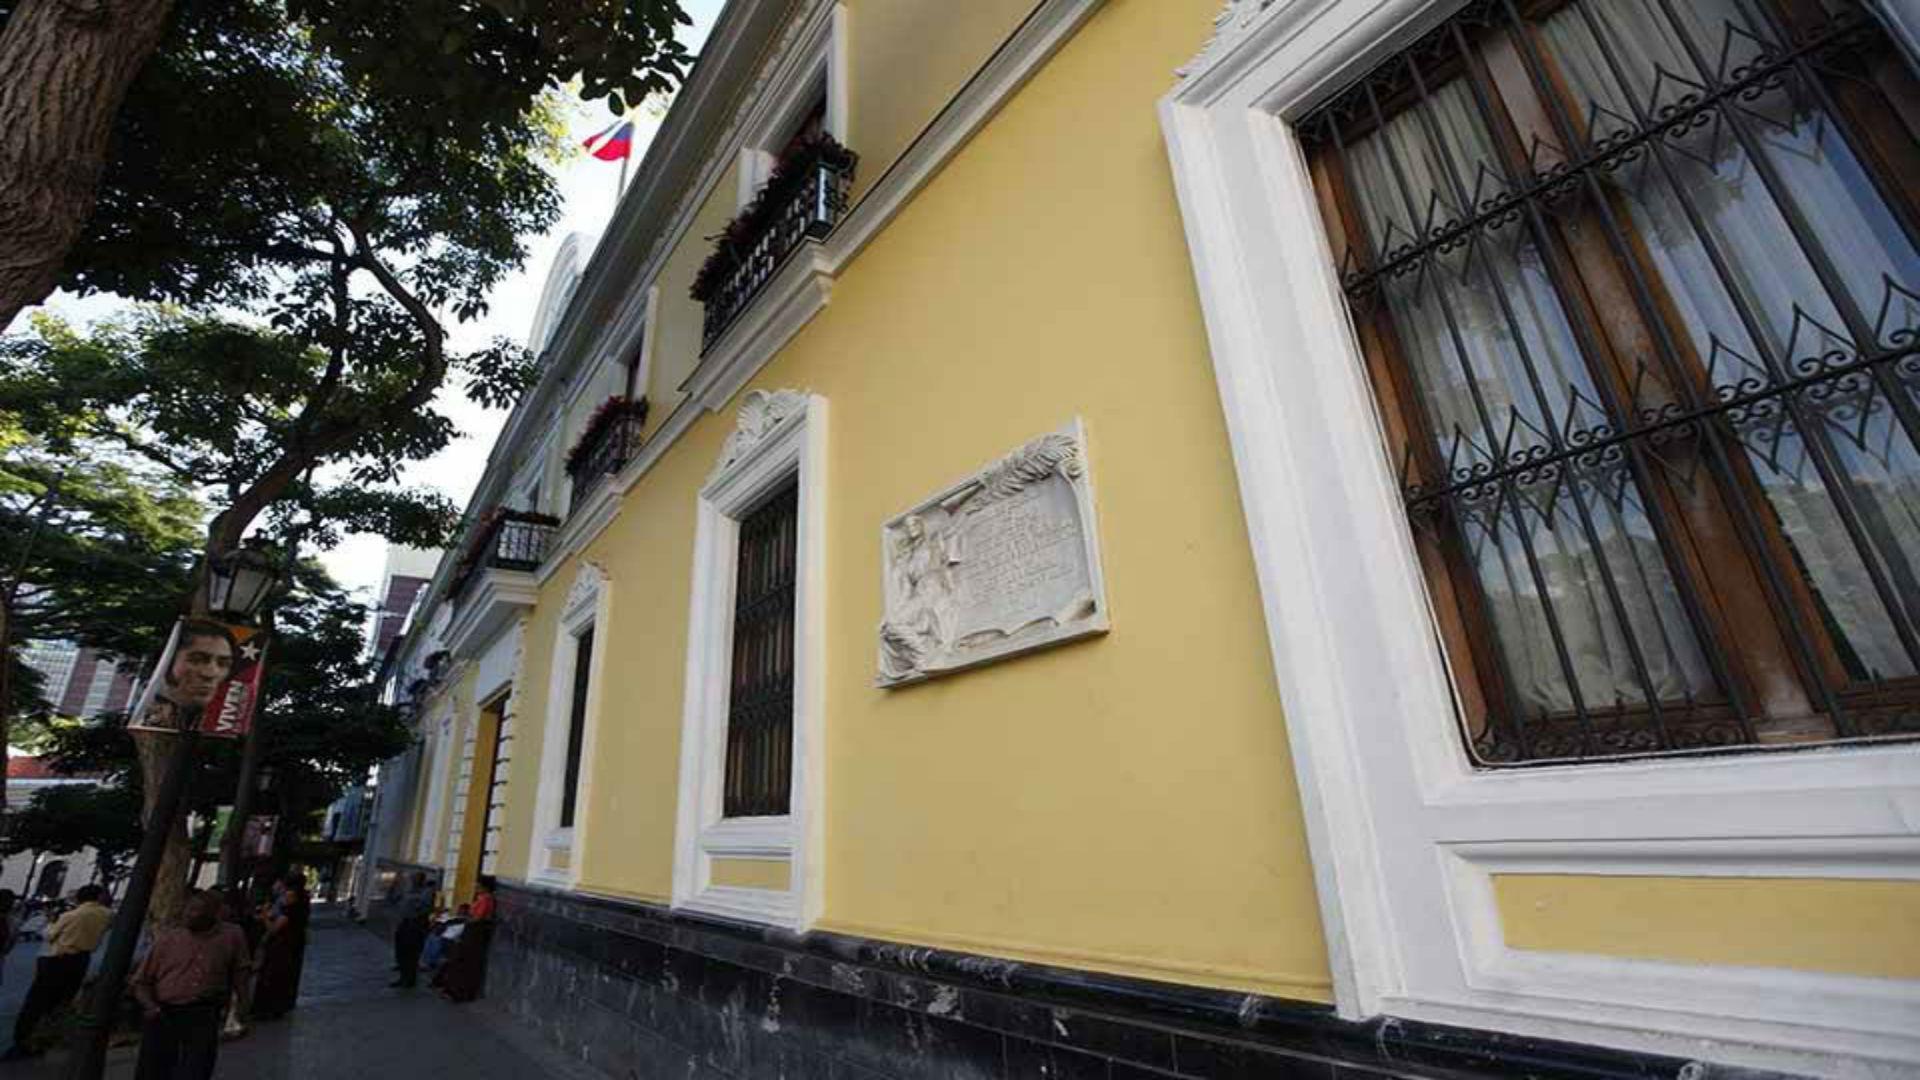 Gobierno de Maduro rechaza la conducta del embajador francés Romain Nadal tras recibir a Guaidó